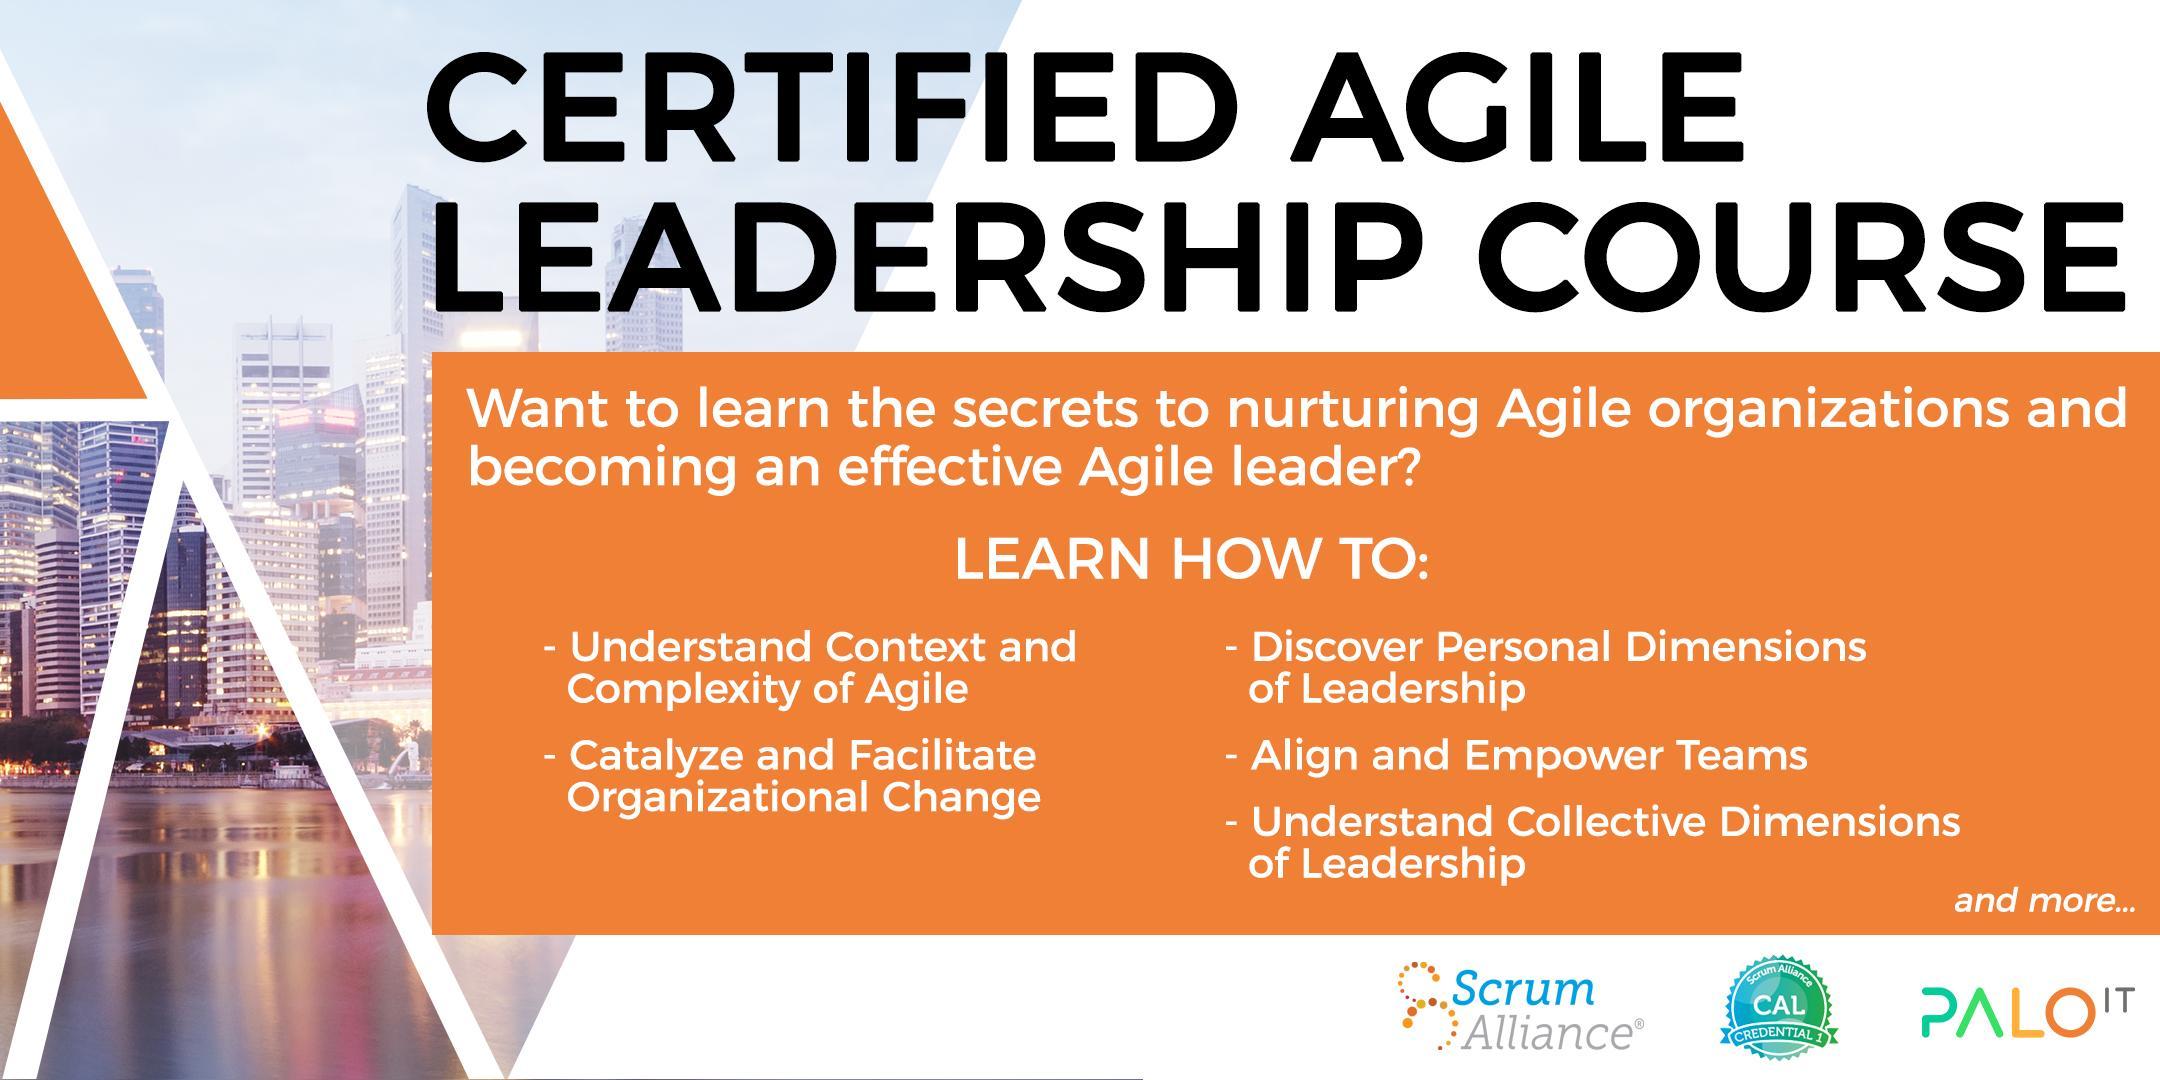 Scrum Alliance Certified Agile Leadership Cal1 Course July 2017